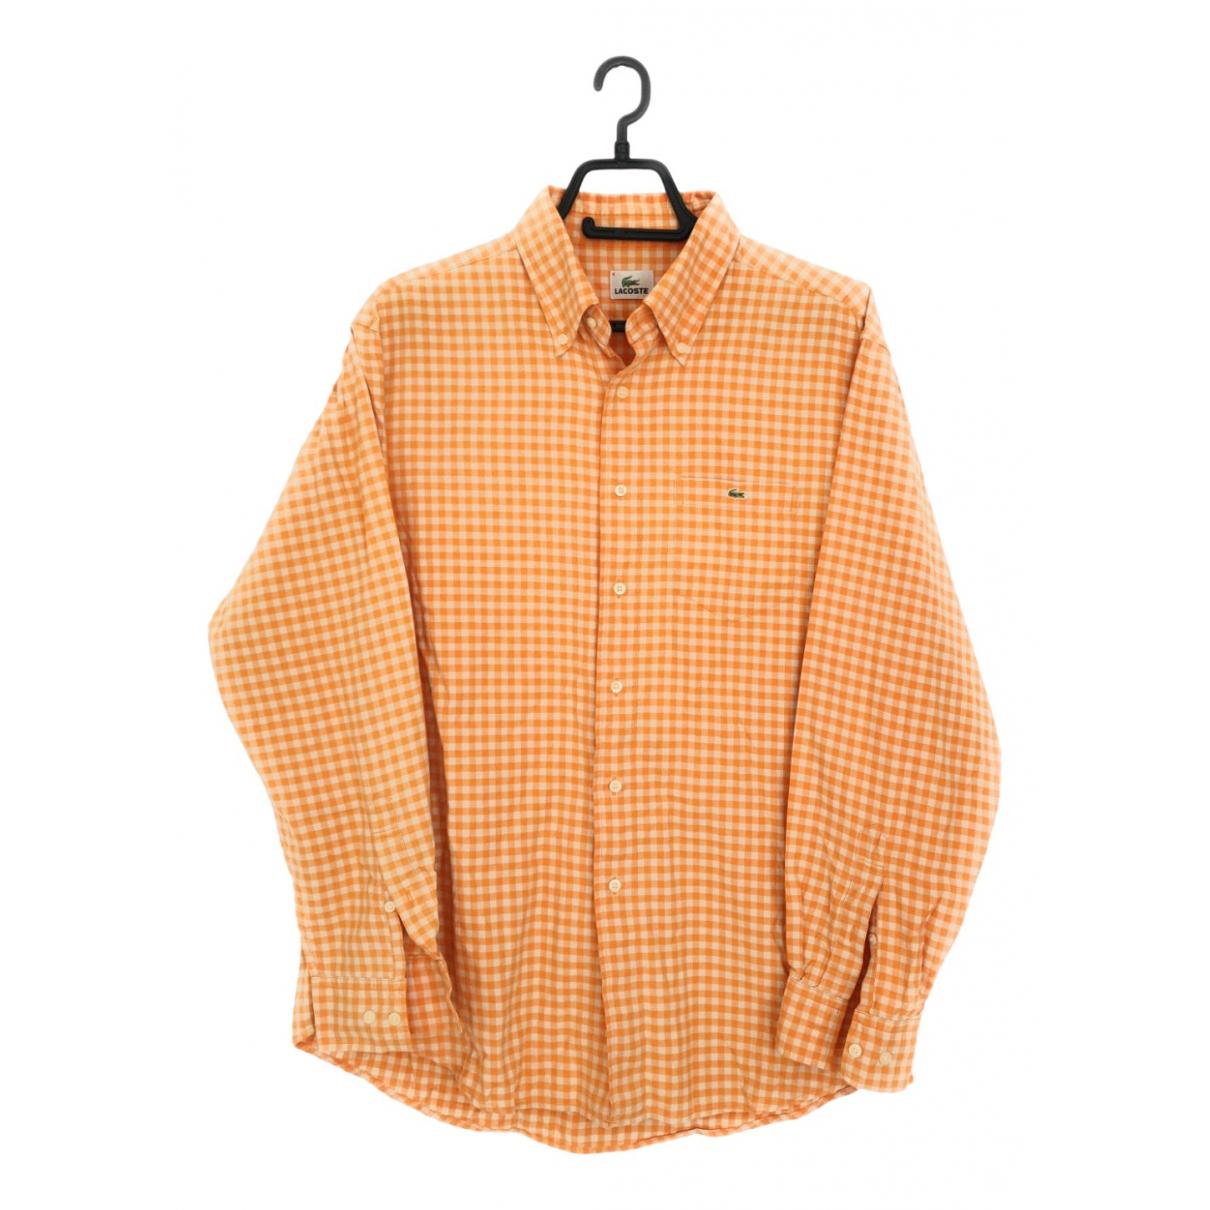 Lacoste \N Orange Cotton Shirts for Men L International